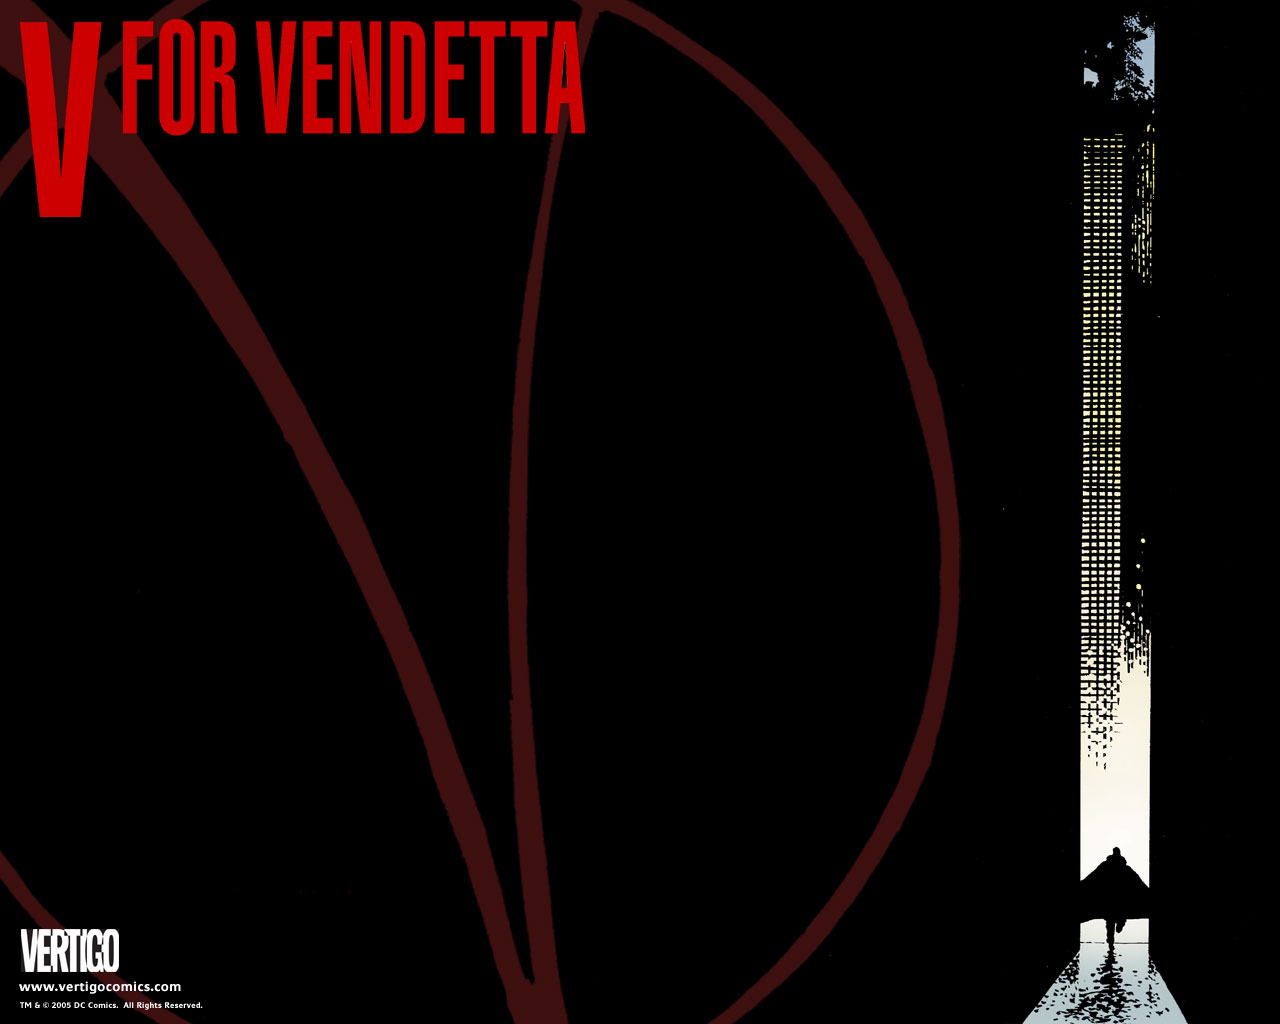 V_For_Vendetta_1280x1024